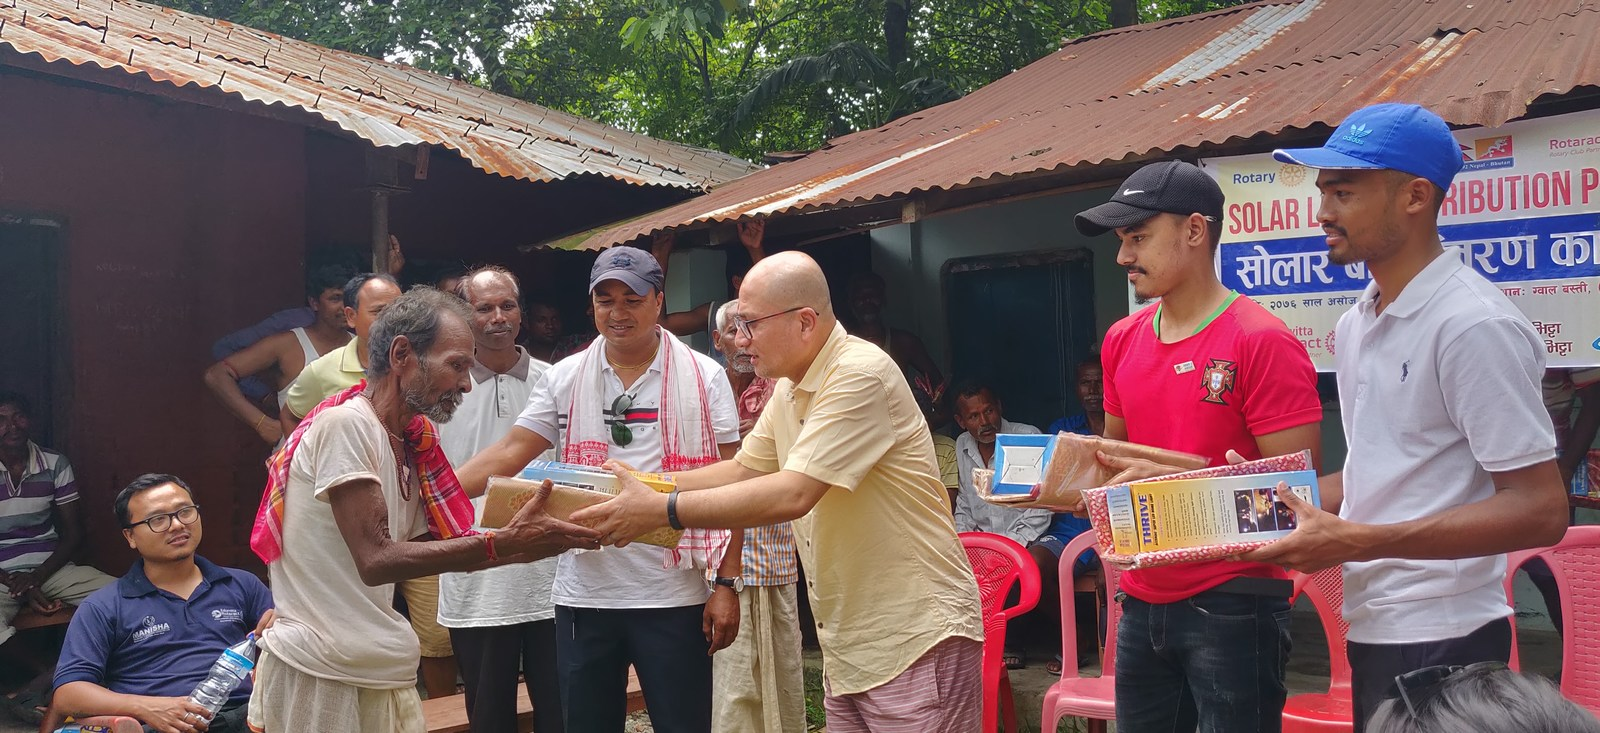 Solar-Light-Distribution-Program-Rotary-Club-of-Kakarvitta-9